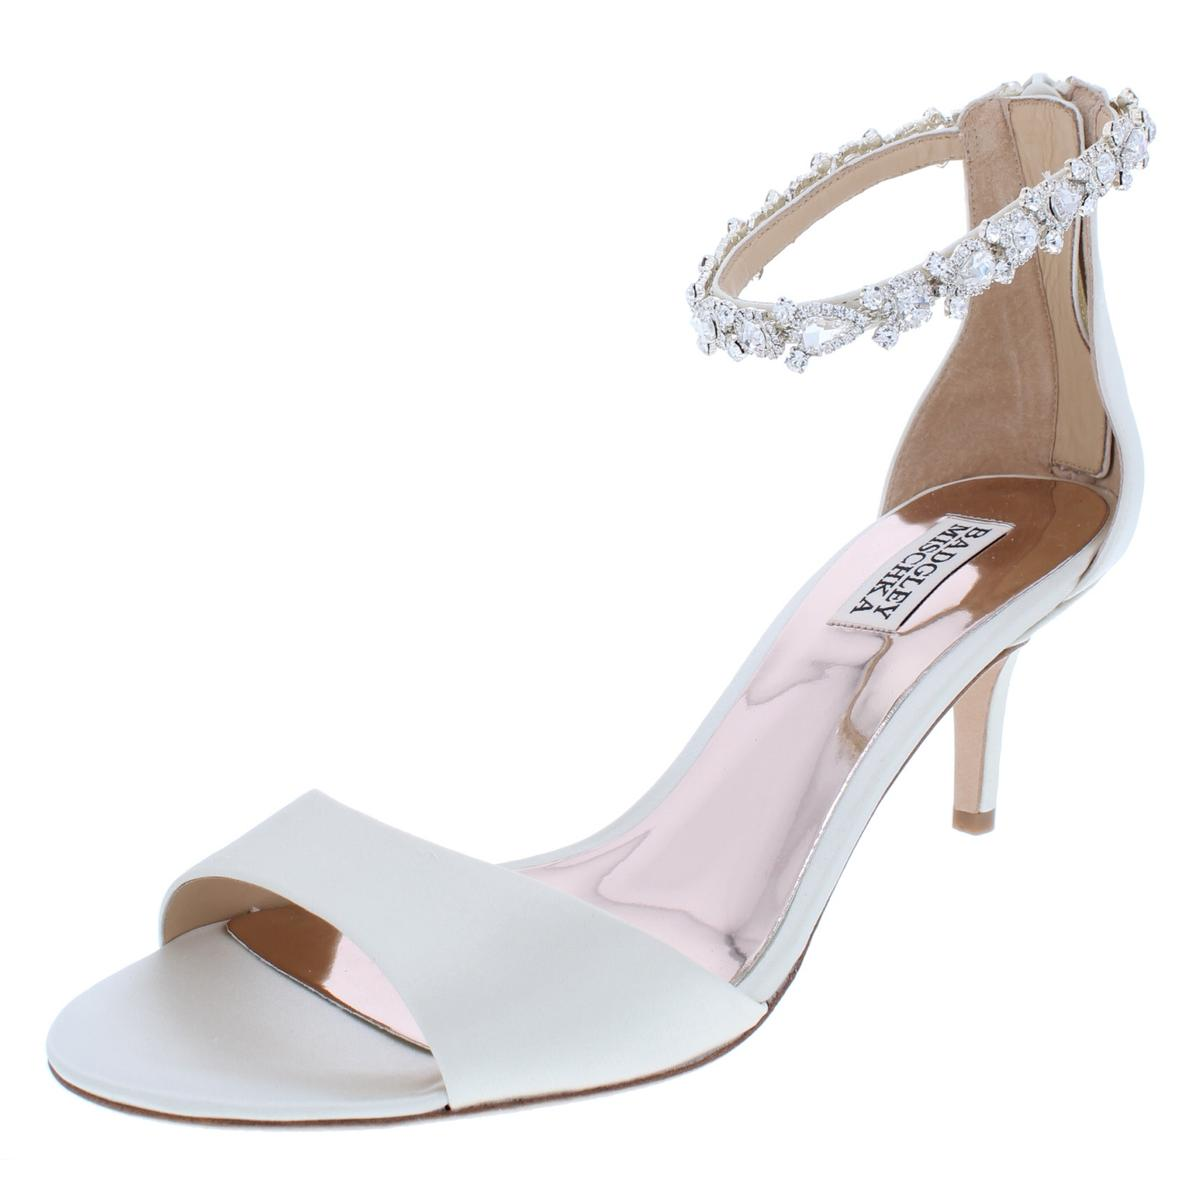 Badgley Mischka Womens Geranium Ivory Dress Sandals 10 Medium (B,M) BHFO 8707